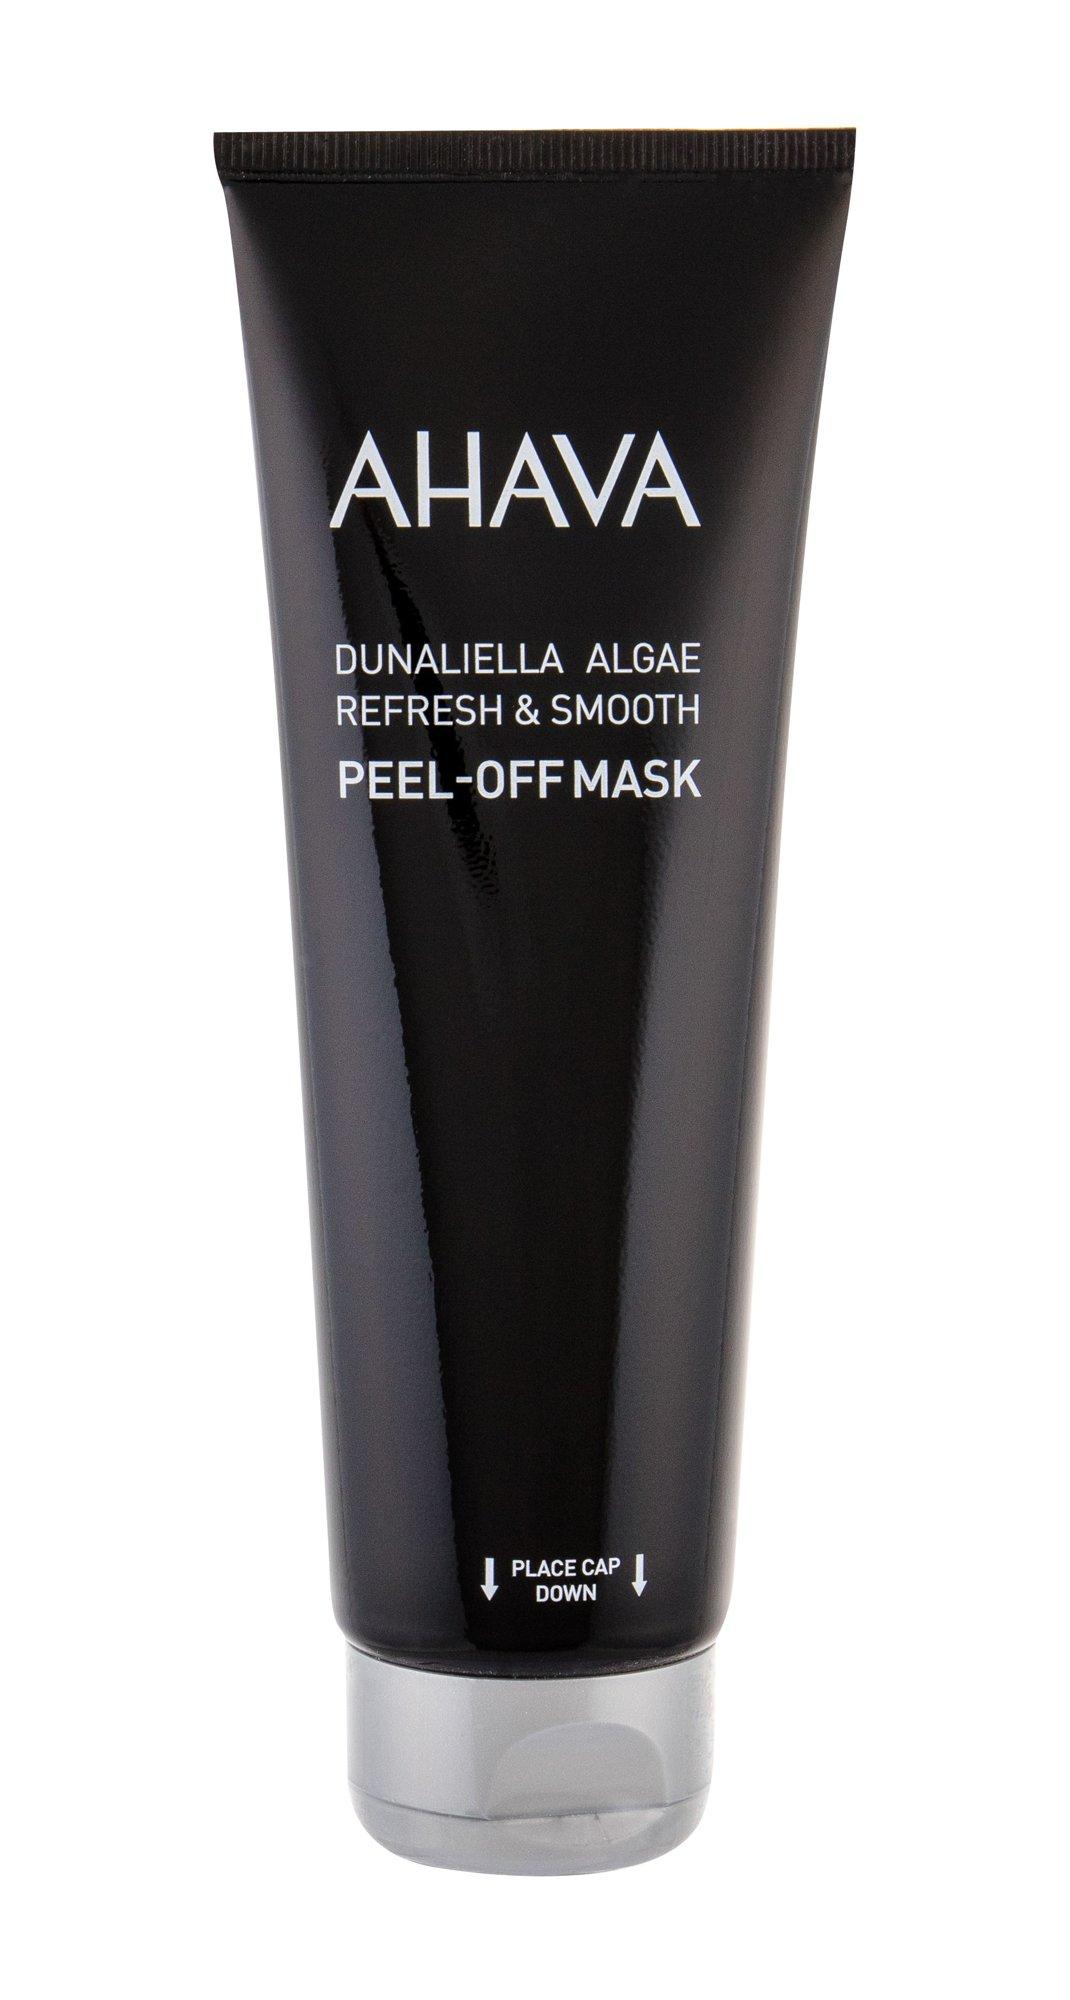 AHAVA Dunaliella Face Mask 125ml  Refresh & Smooth